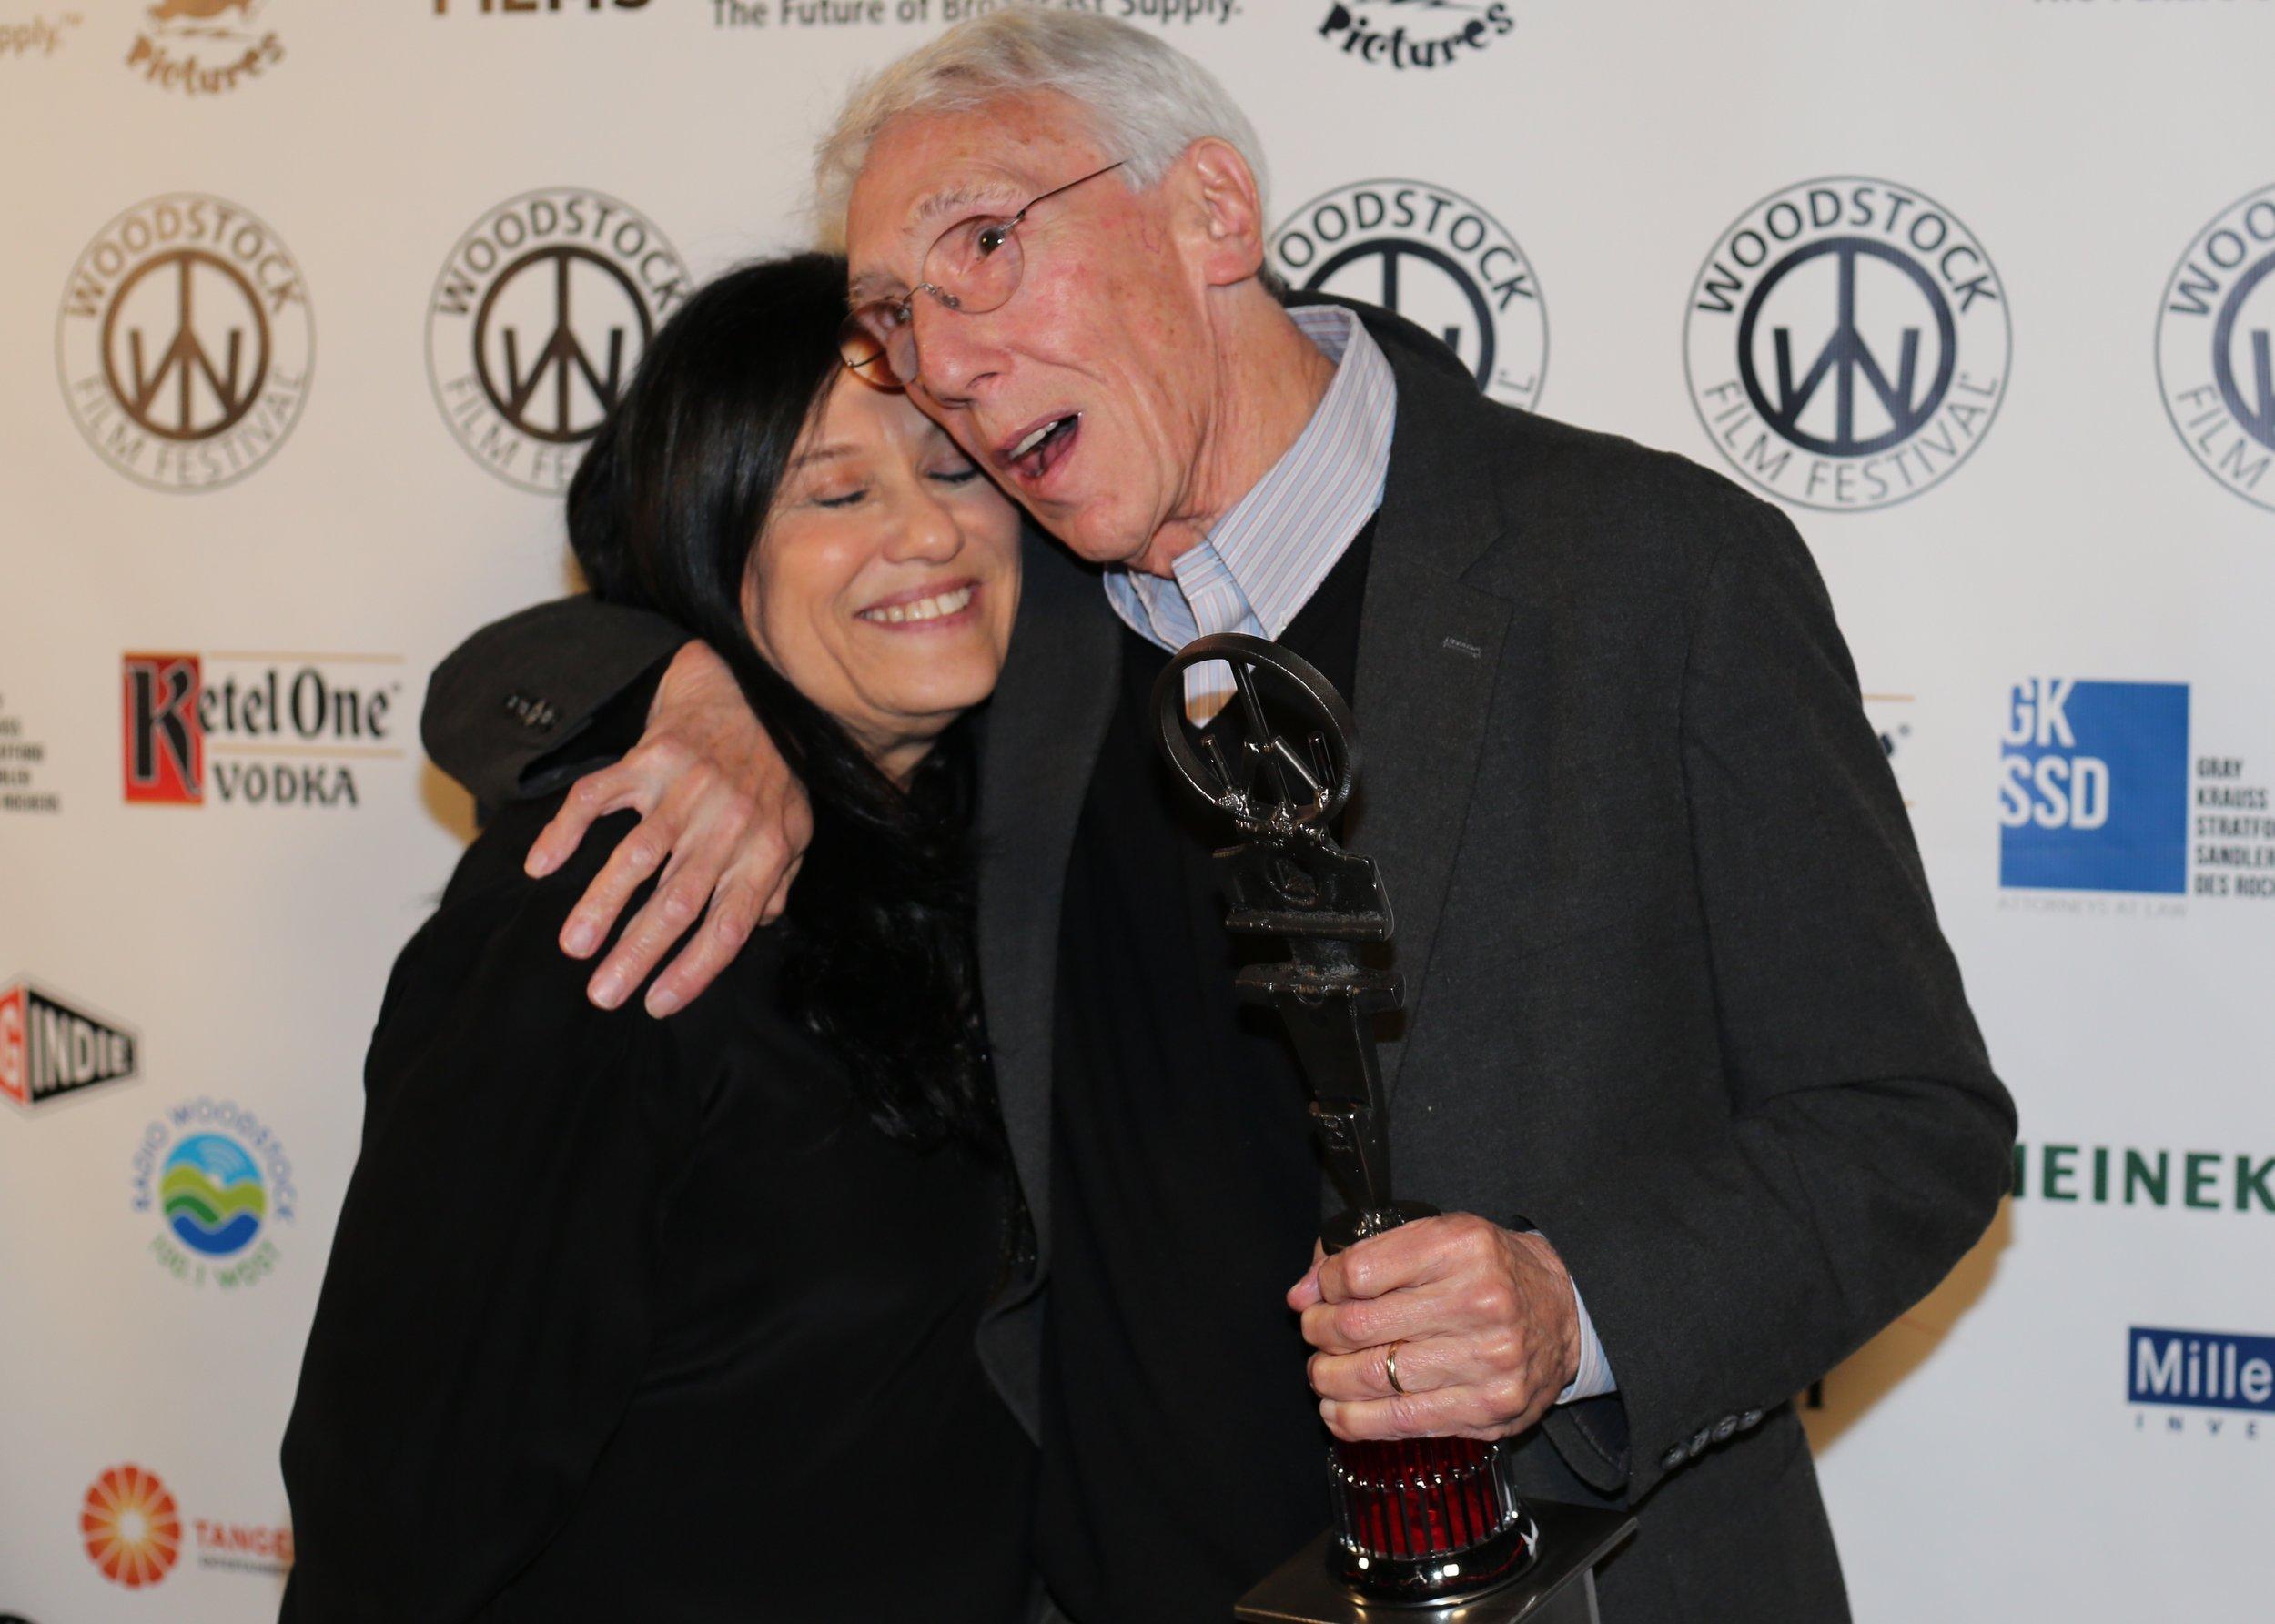 Esteemed filmmaker and Lifetime Achievement Award recipient  Leon Gast  with celebrated documentarian and award presenter  Barbara Kopple.  Photo by Laura R  evercomb